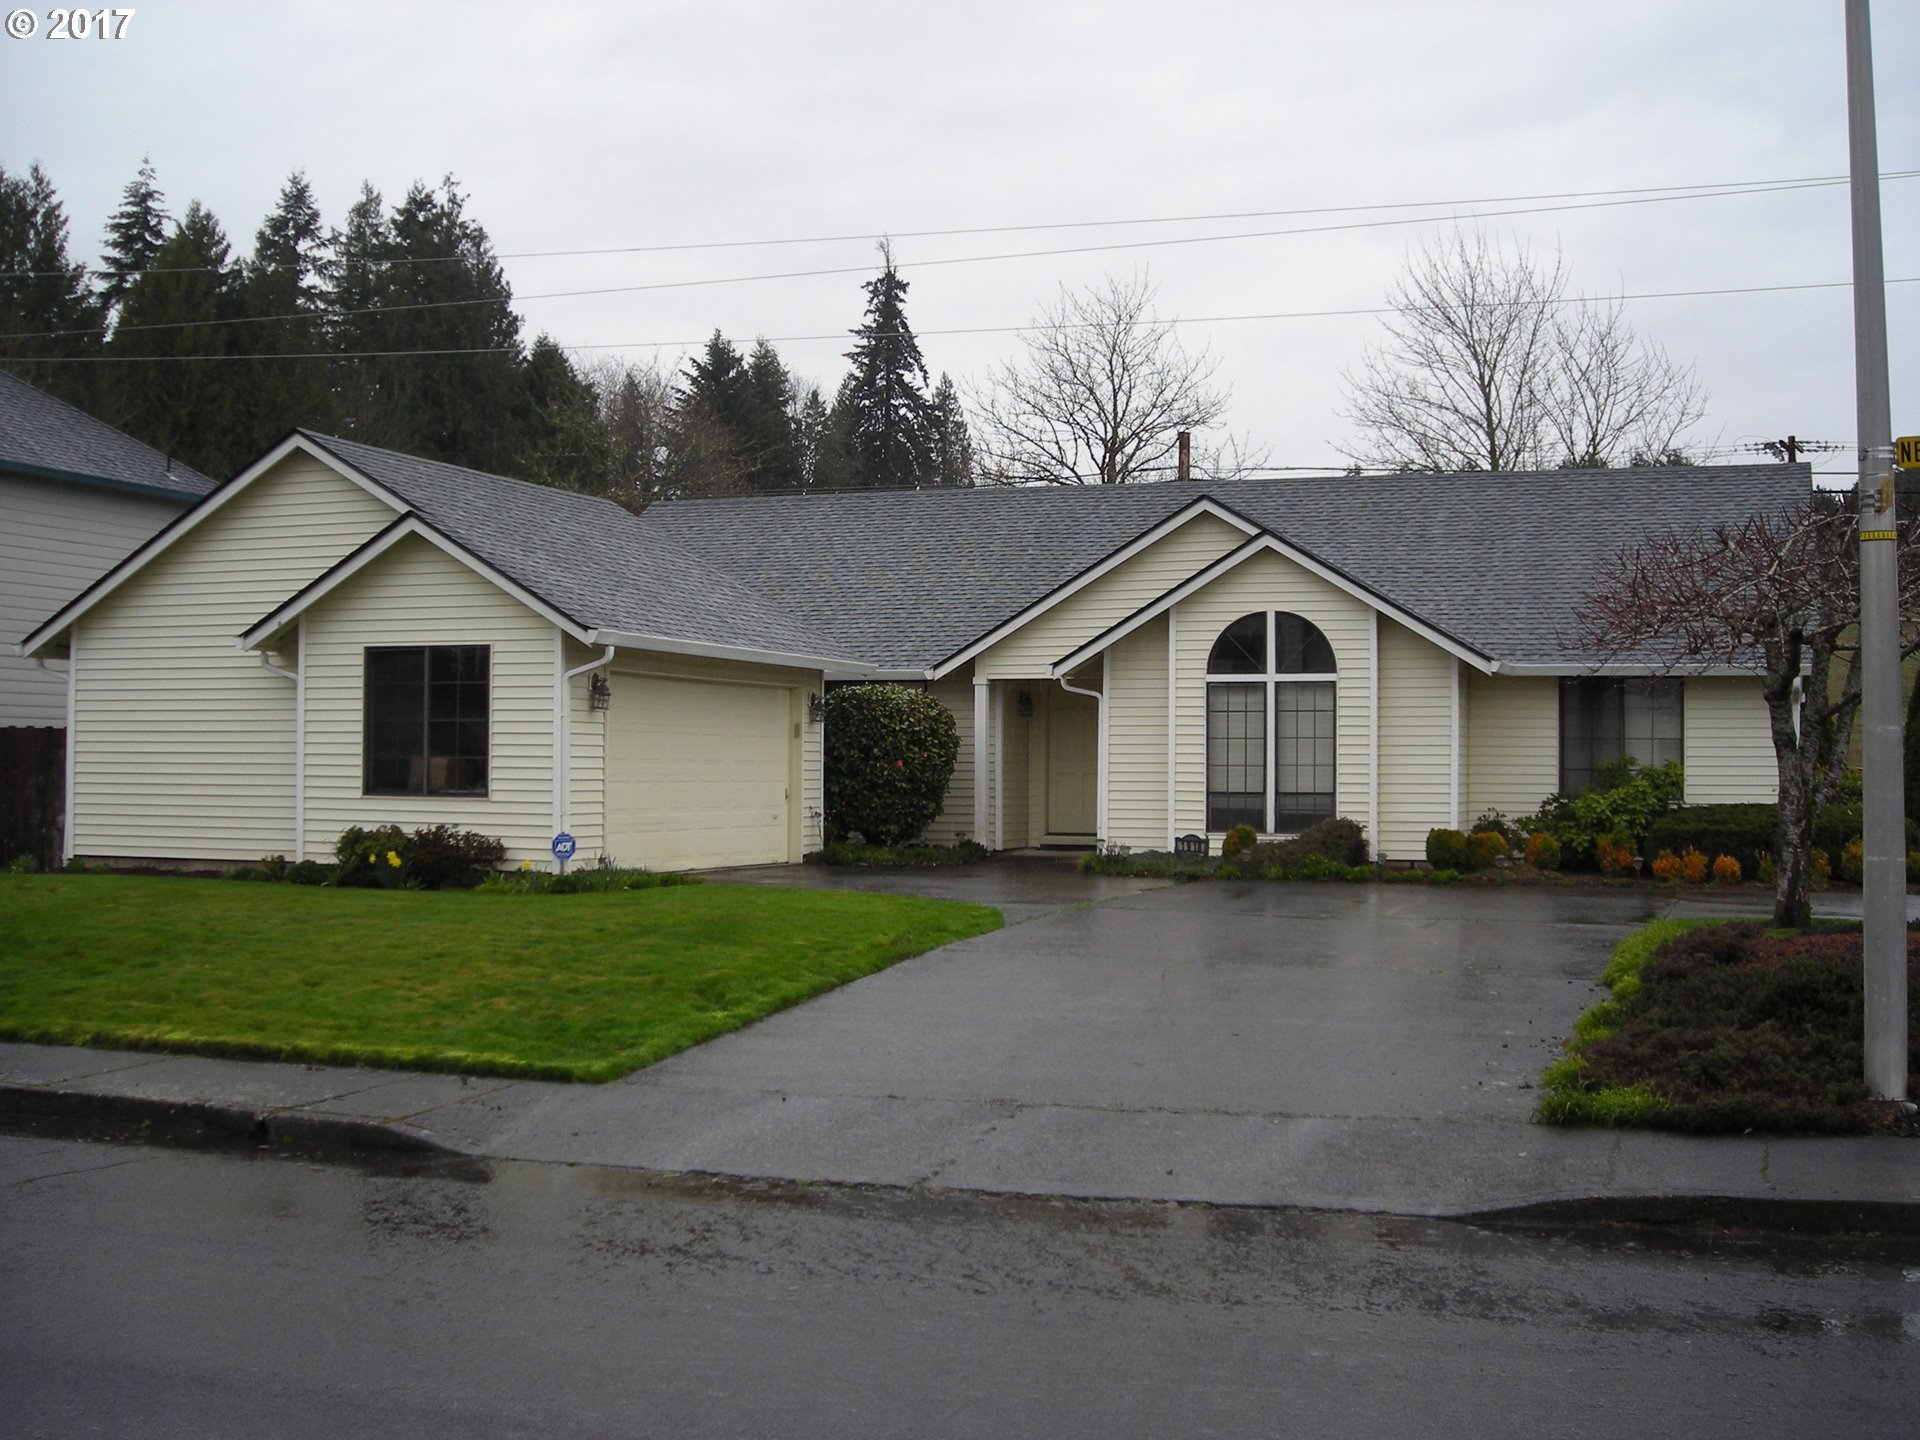 1918 NE 67TH ST, Vancouver, WA 98665